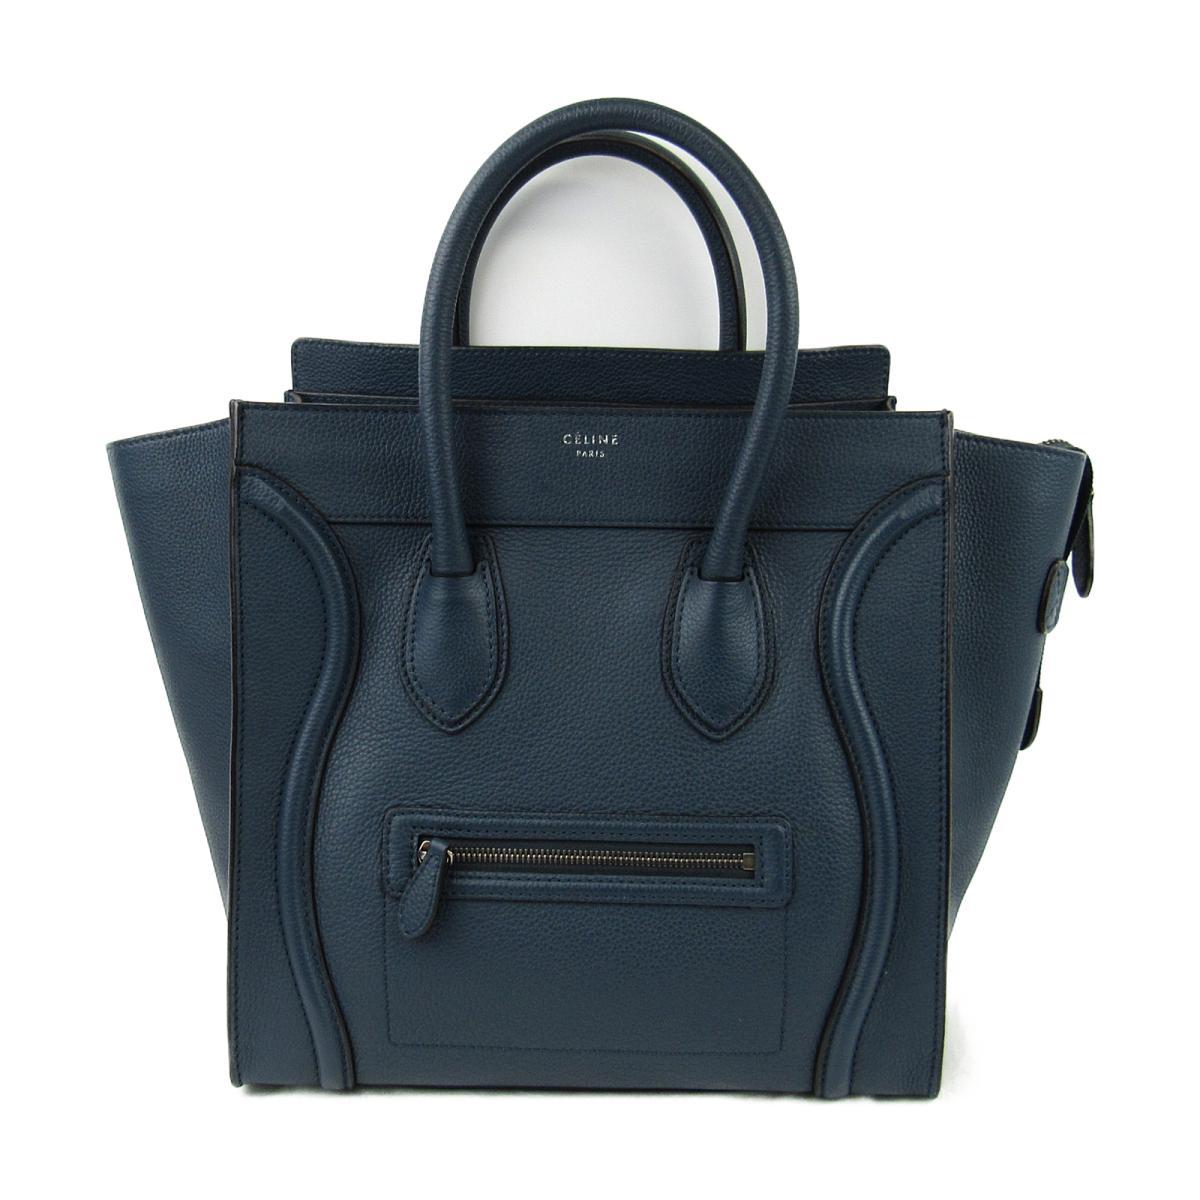 81e098ecddfe BRANDOFF  Authentic CELINE Luggage Mini Shopper Tote Bag HandBag ...